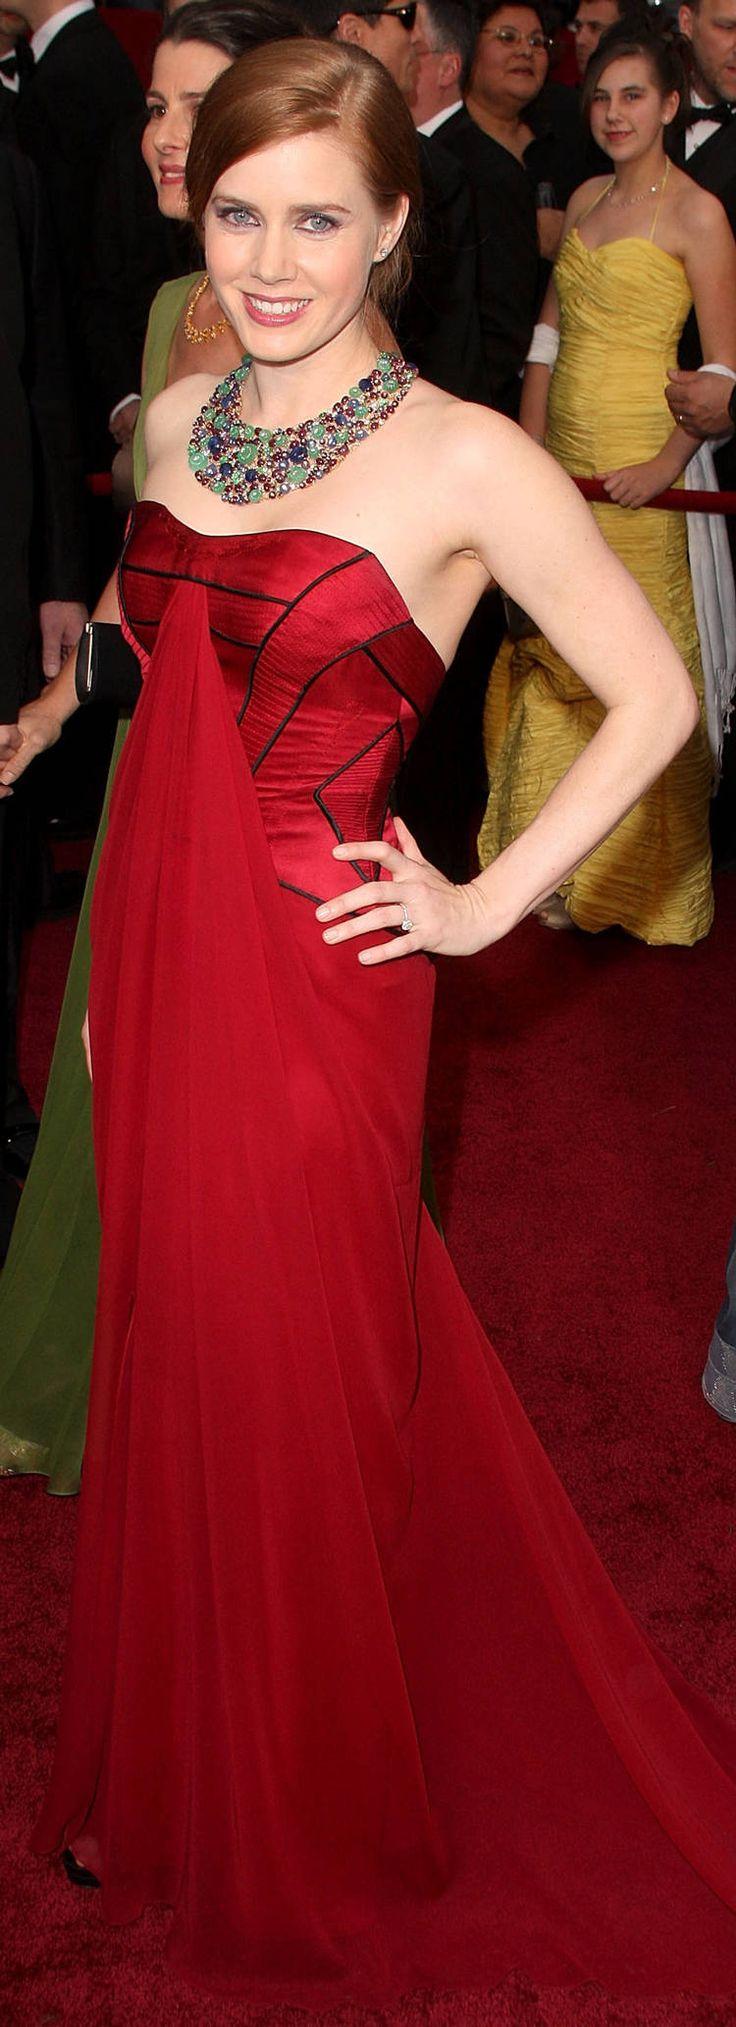 Amy Adams wears Carolina Herrera - Academy Awards 2009: Amy Adam, Celebrity Style, Celebrityfashion Redcarpet, Seeking Amy, Red Carpets, Carolina Herrera, Academy Awards, Oscars Dresses, 2009 Oscars